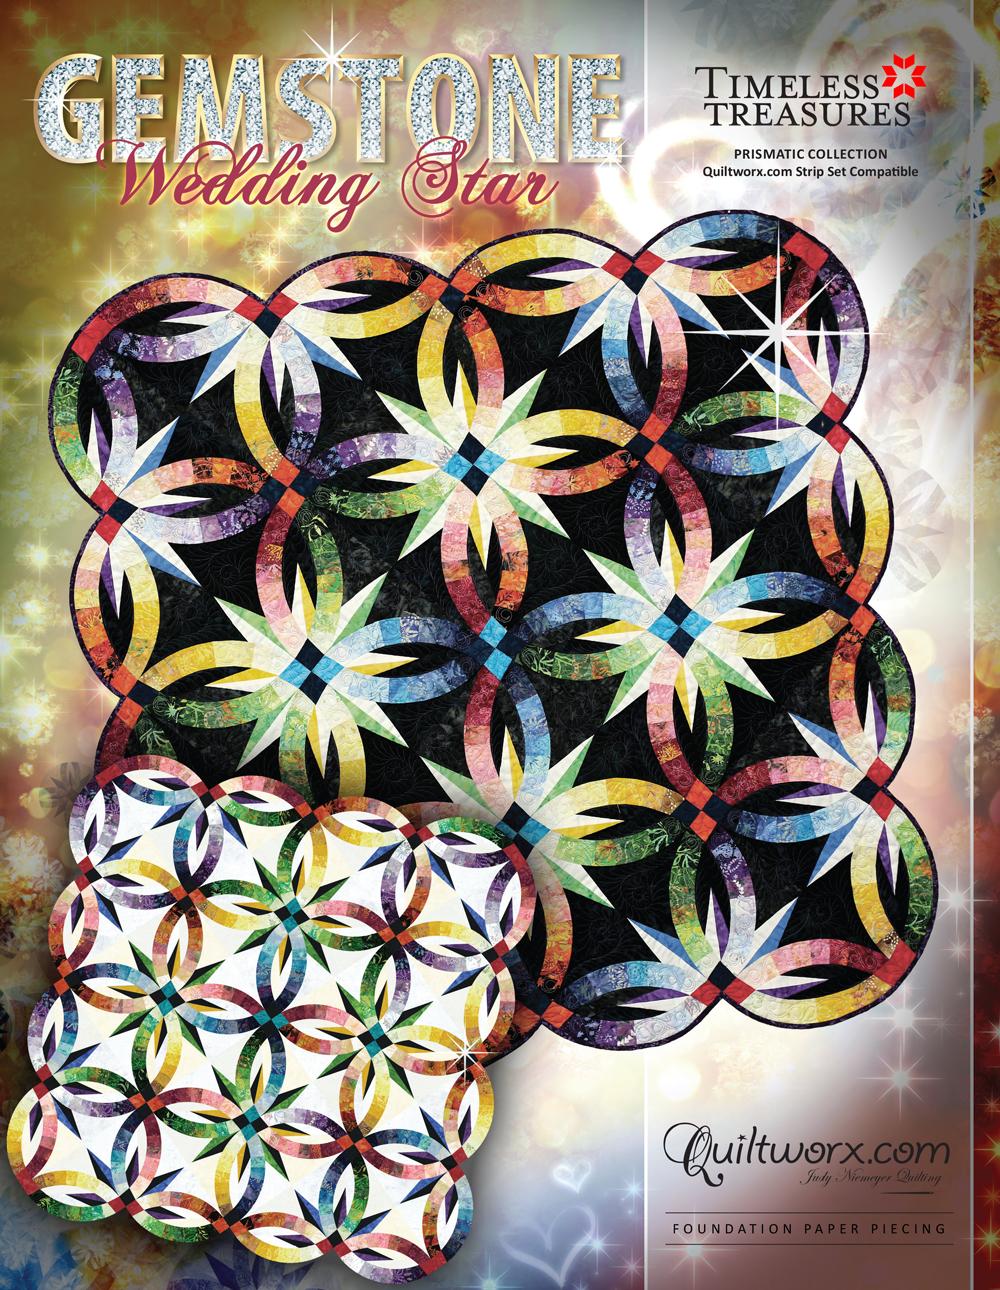 Gemstone-Wedding-Star-Prismatic-Strip-Set-CS